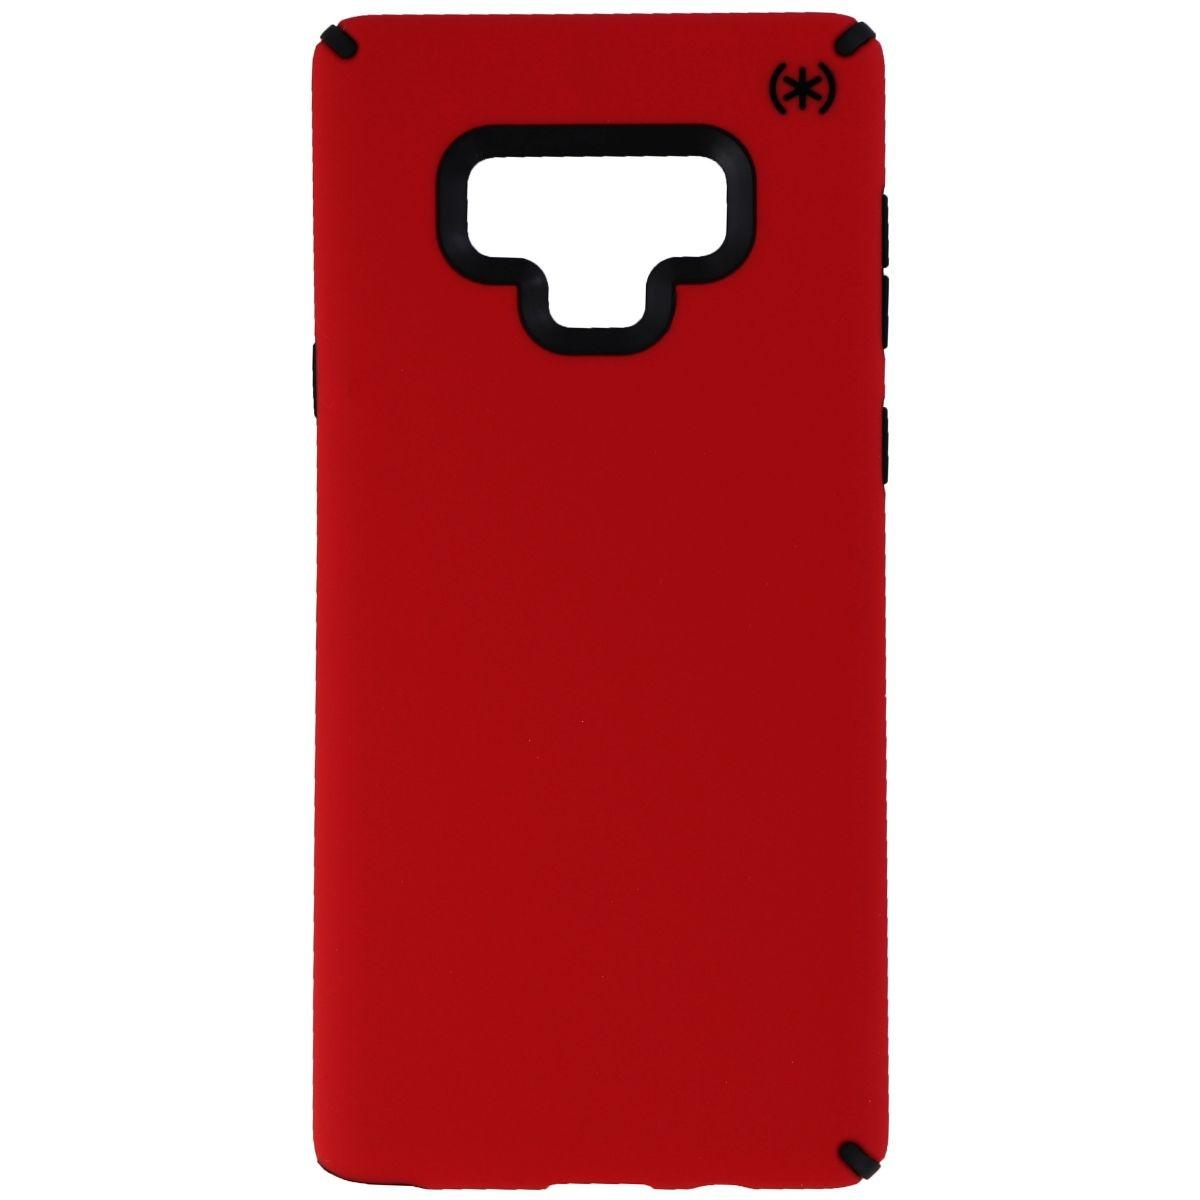 Speck Presidio Pro Case For Samsung Galaxy Note 9 - Heartrate Red/black